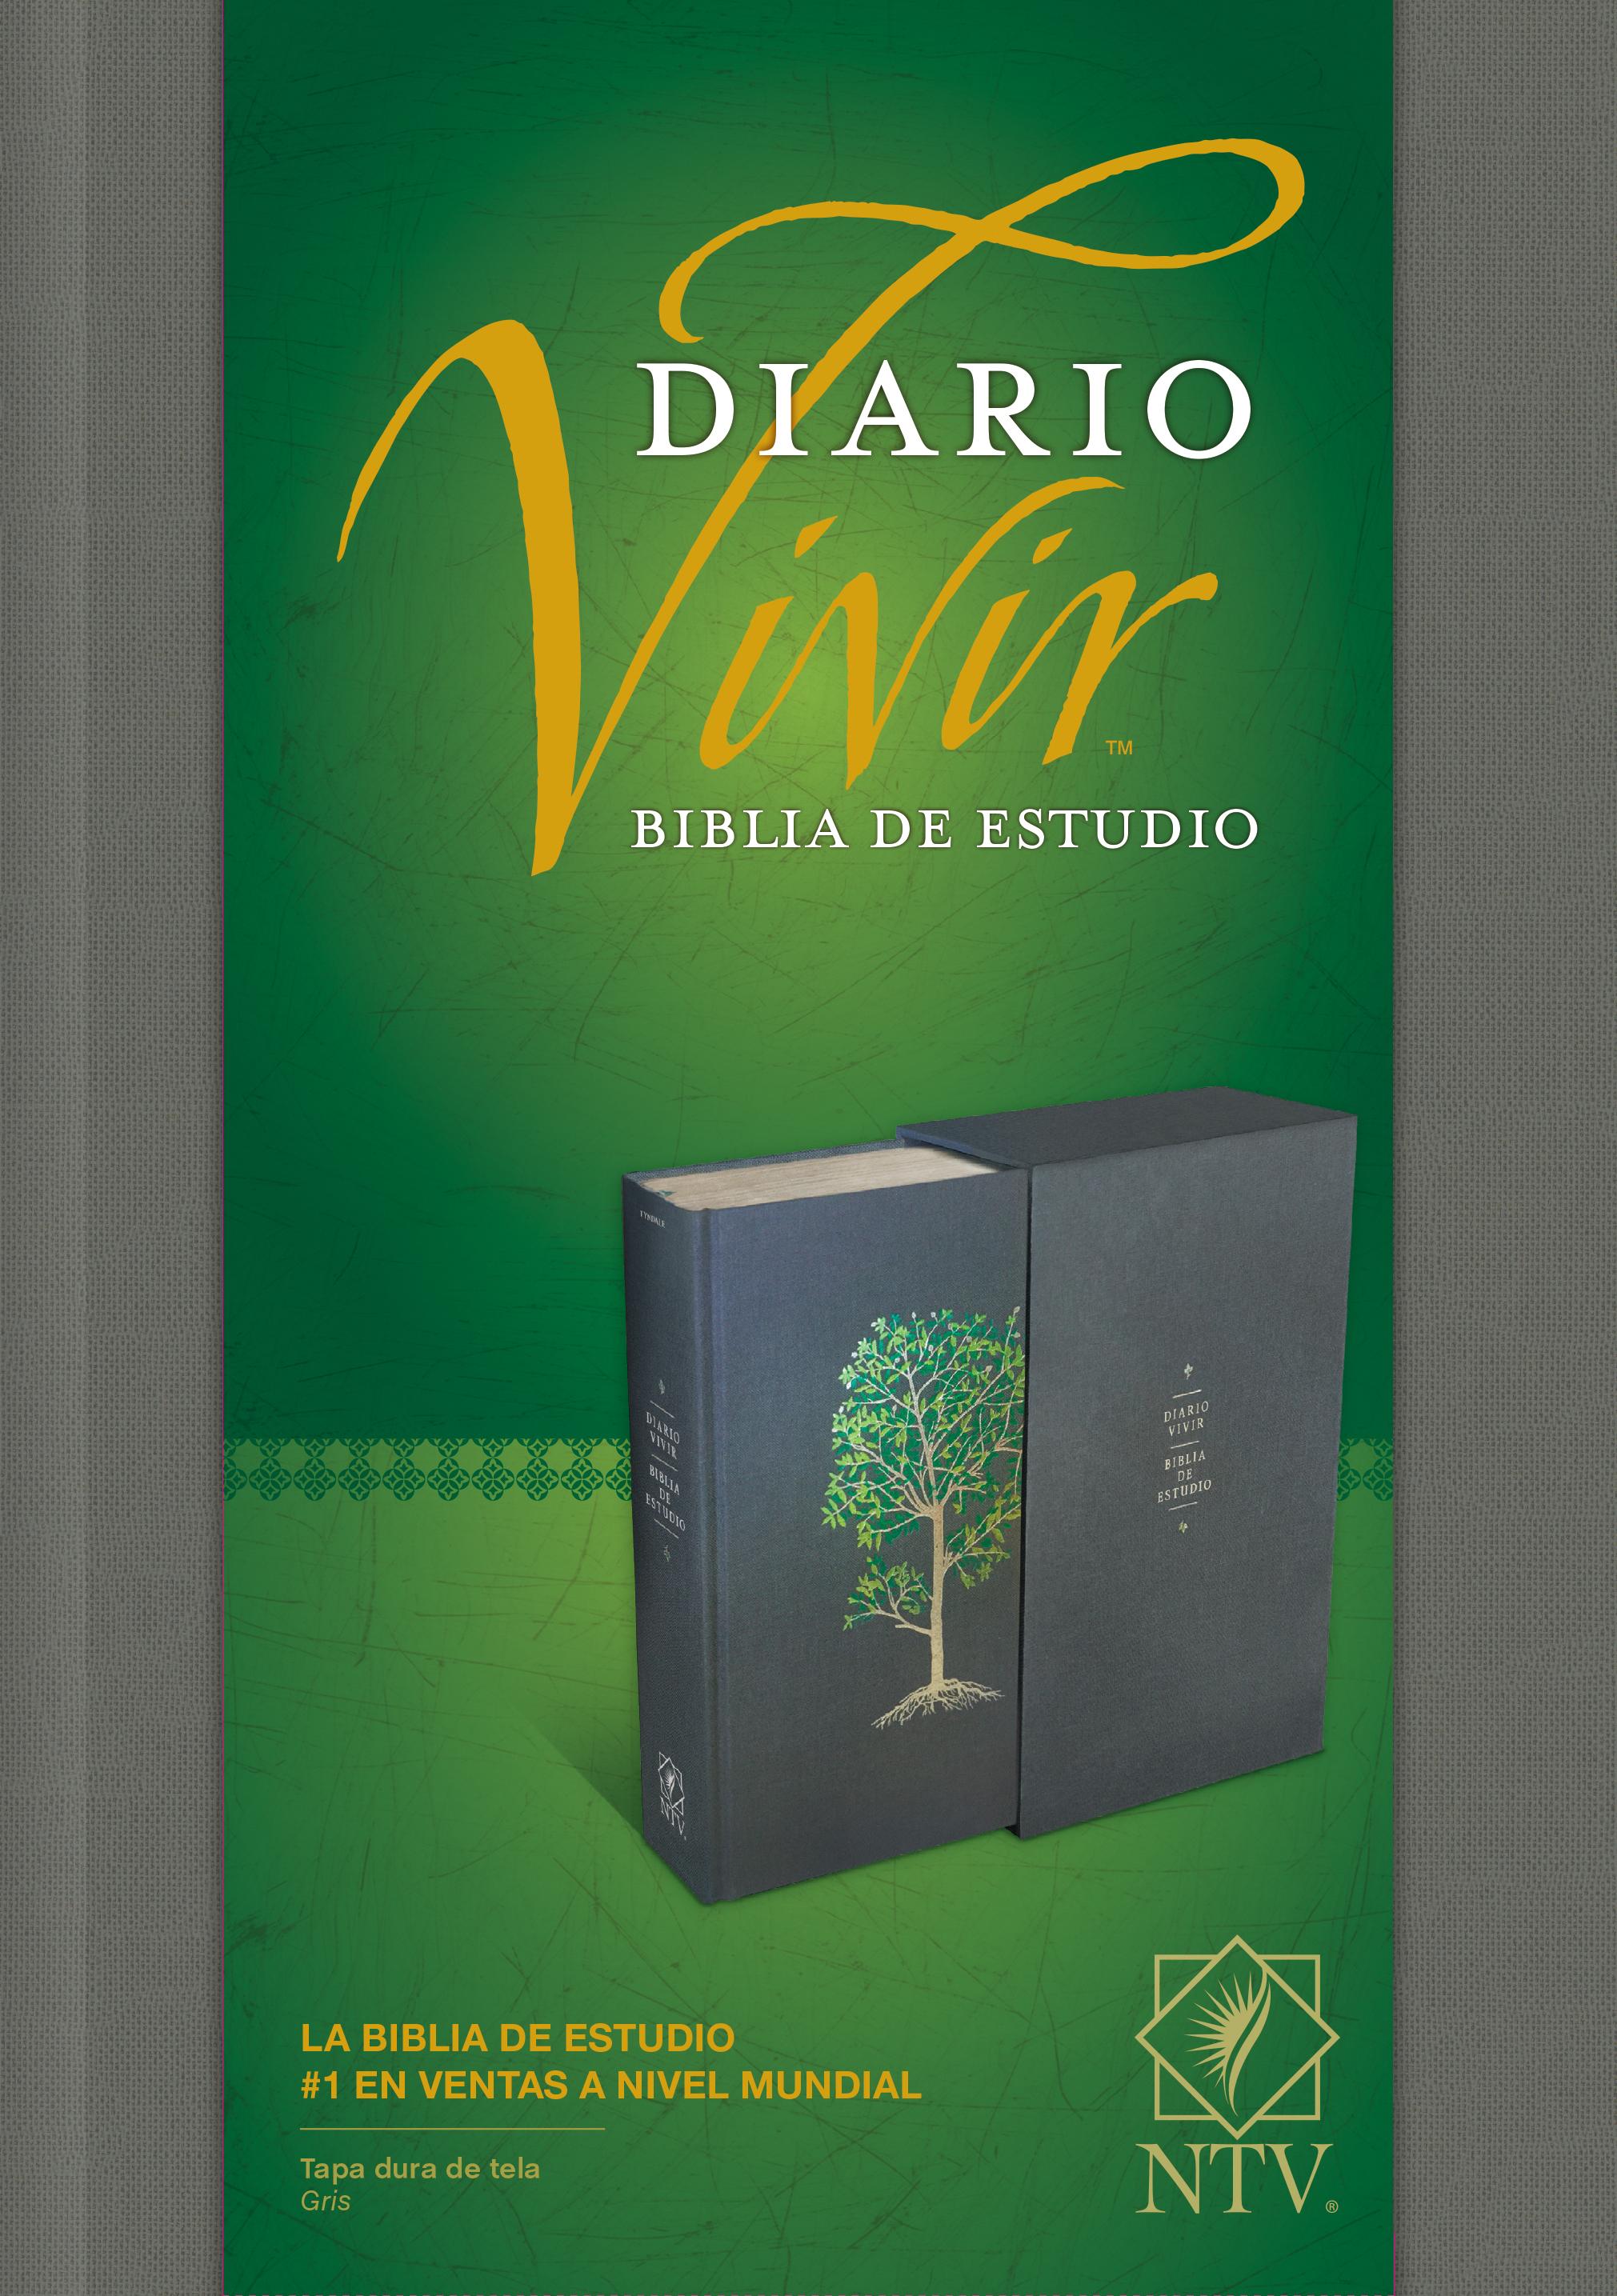 Biblia de estudio del diario vivir NTV (Letra Roja, Tapa dura de tela, Gris)